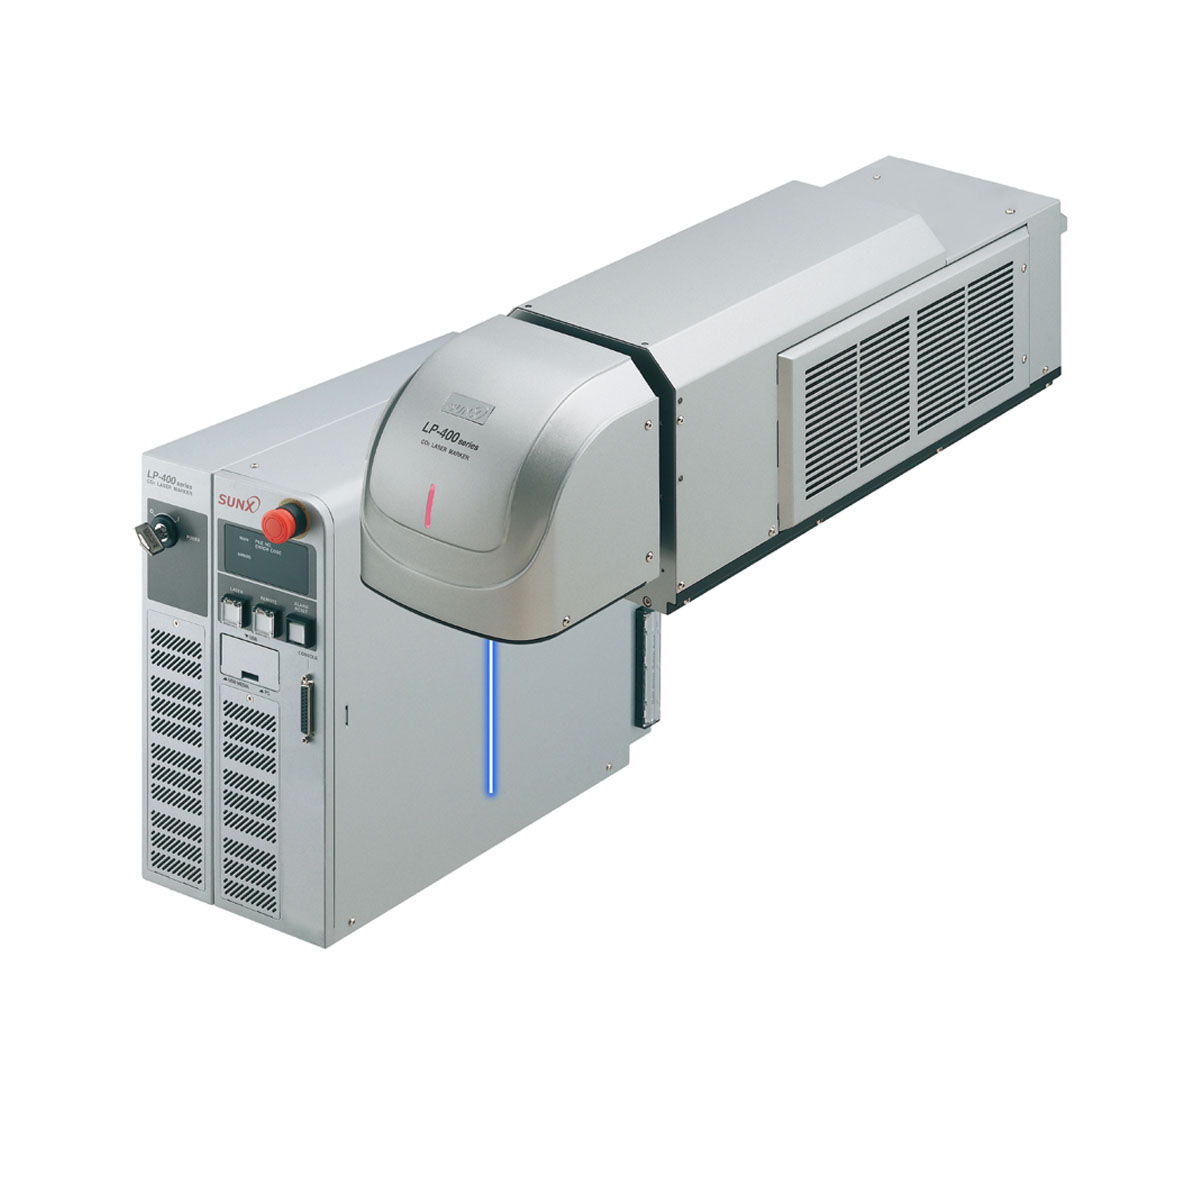 PANASONIC / SUNX LP-400 SERIES เครื่องพิมพ์ตัวอักษรด้วยเลเซอร์ ชนิด CO2 Laser Marker